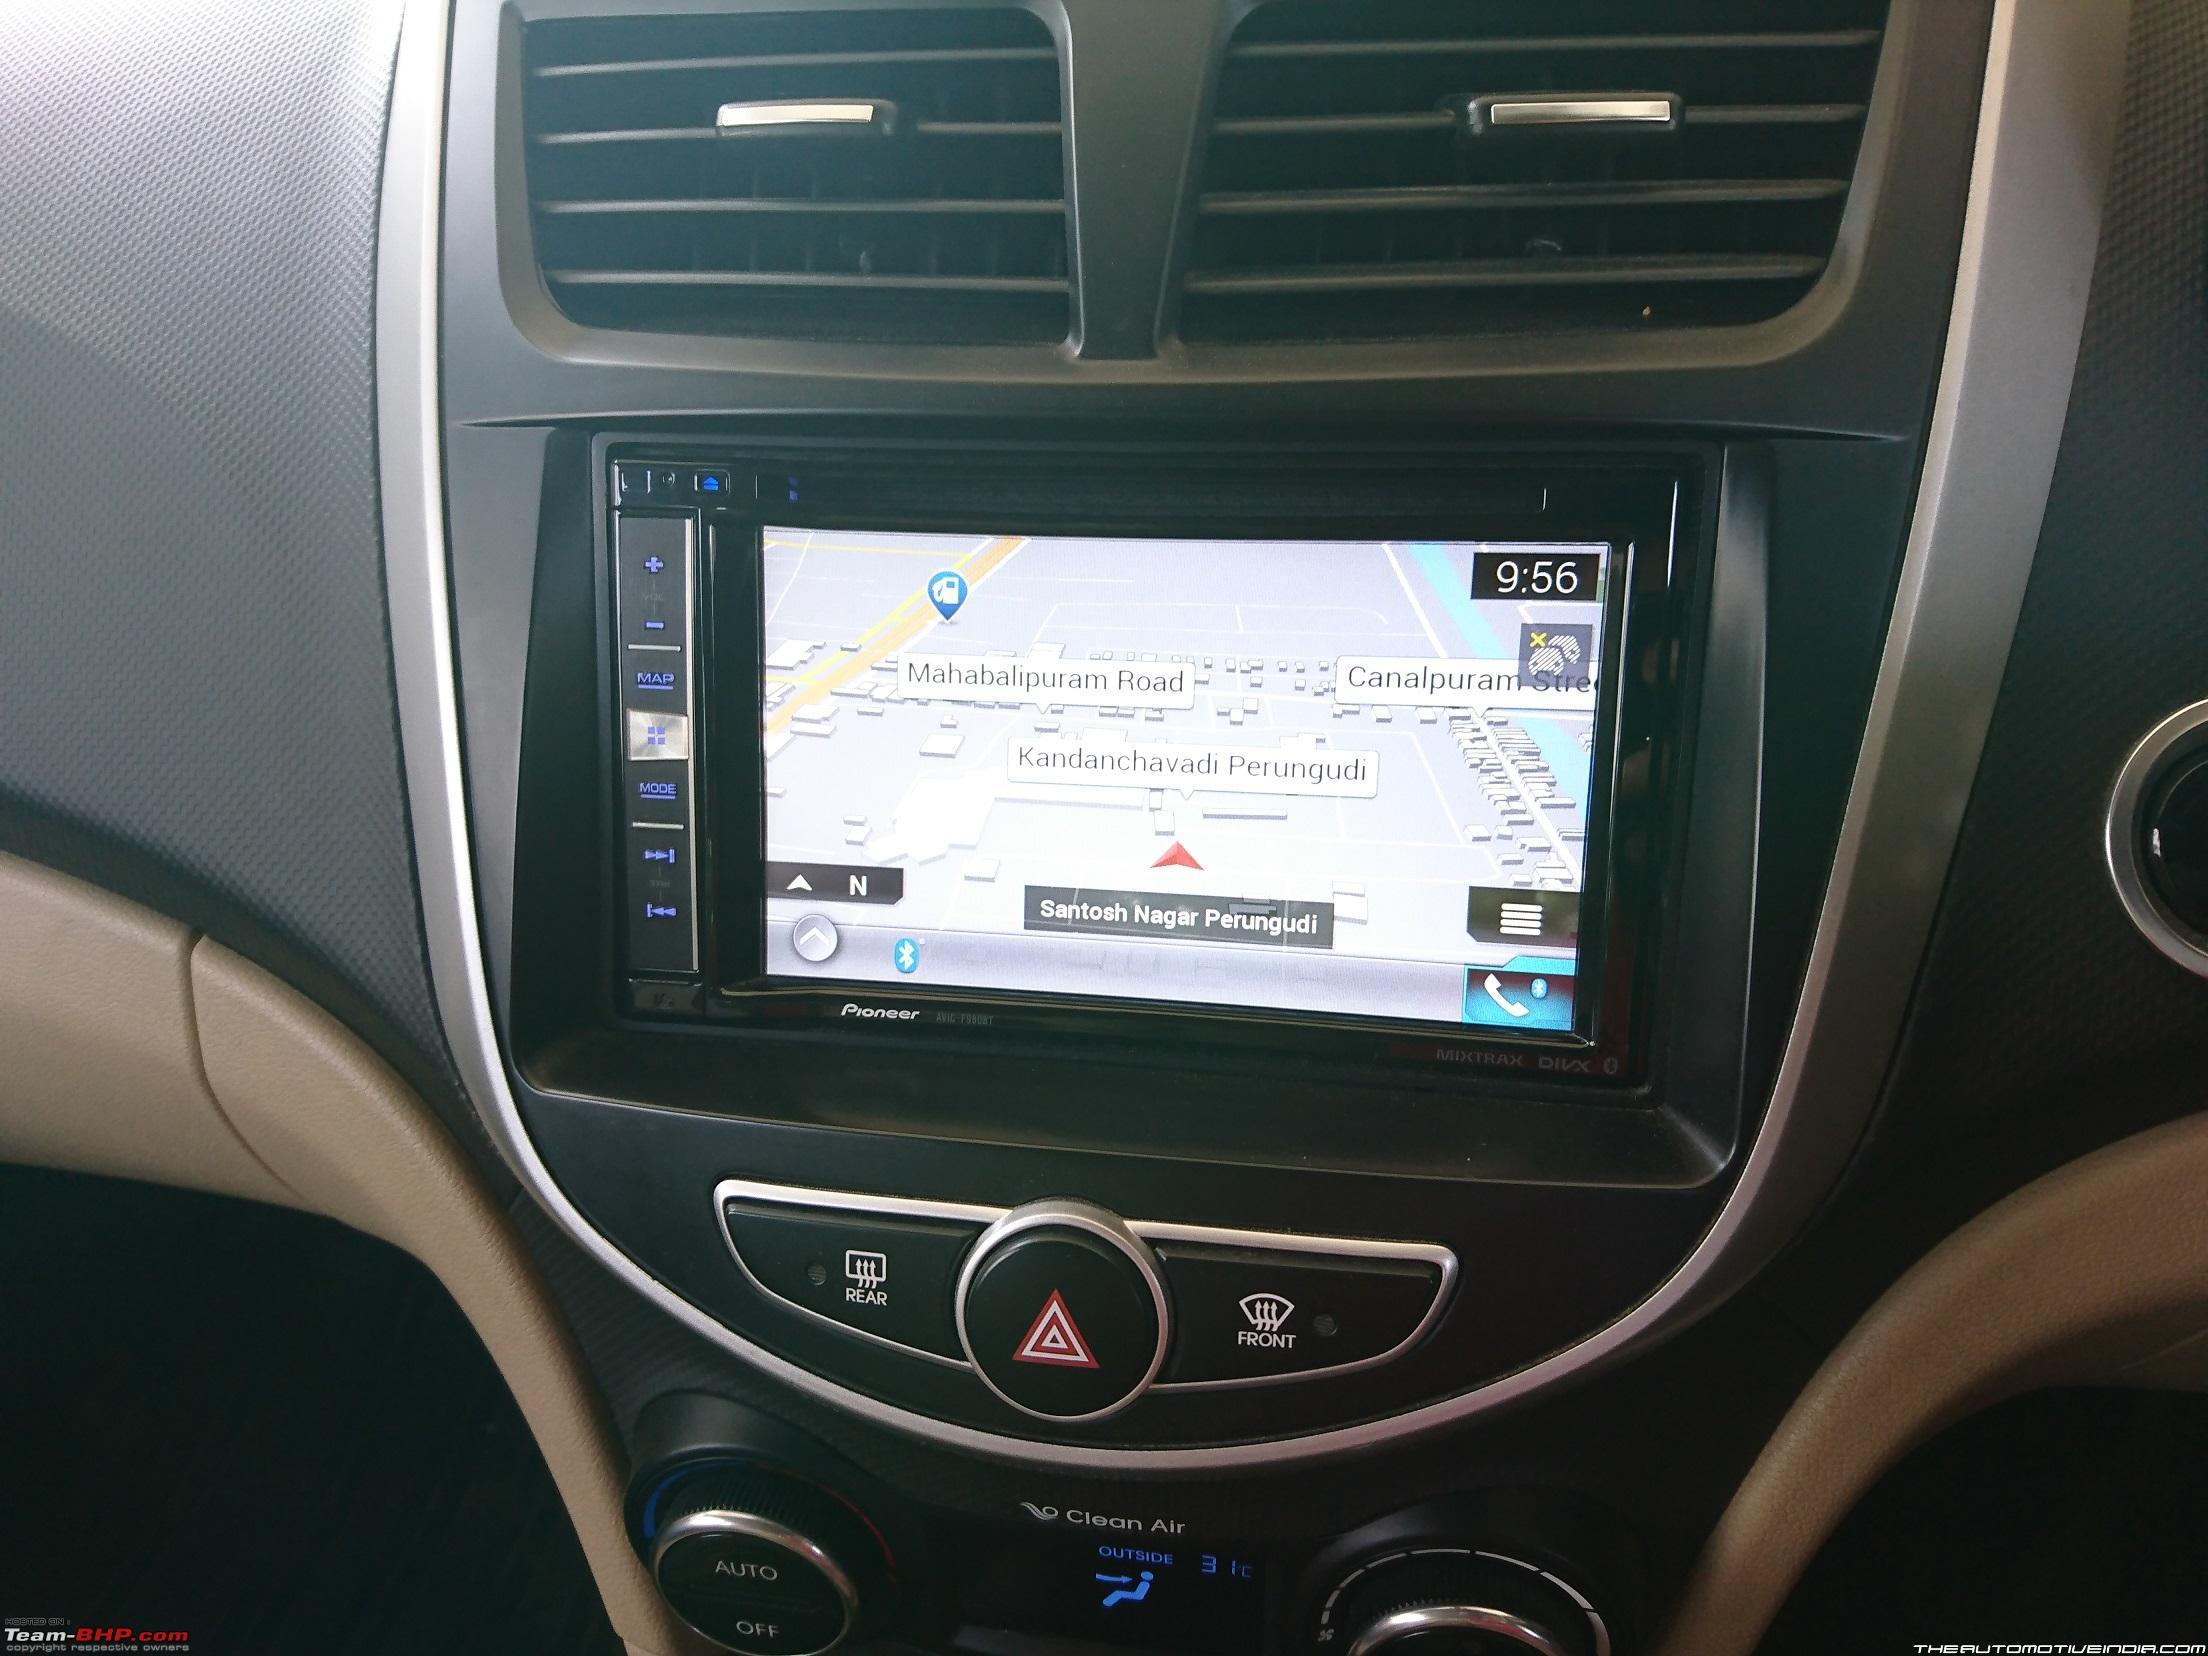 Hyundai Fluidic Verna : Upgraded to OEM Head-Unit with